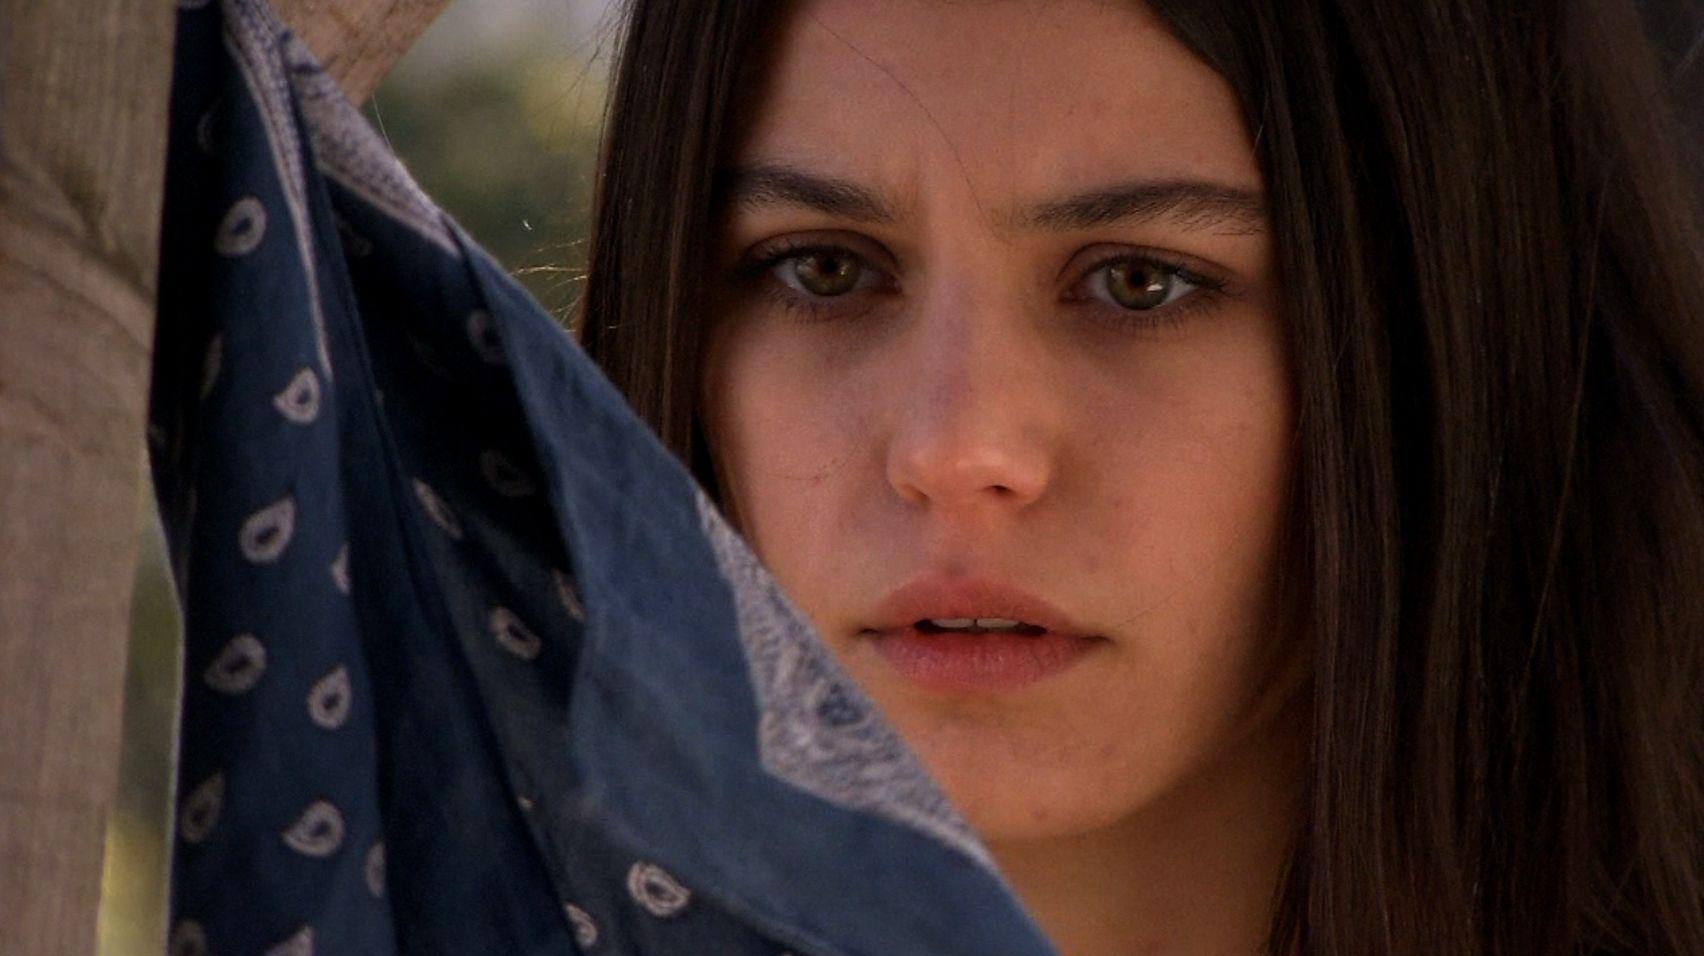 Beren Saat interpreta a meiga Fatmagül na trama / Divulgação - Band